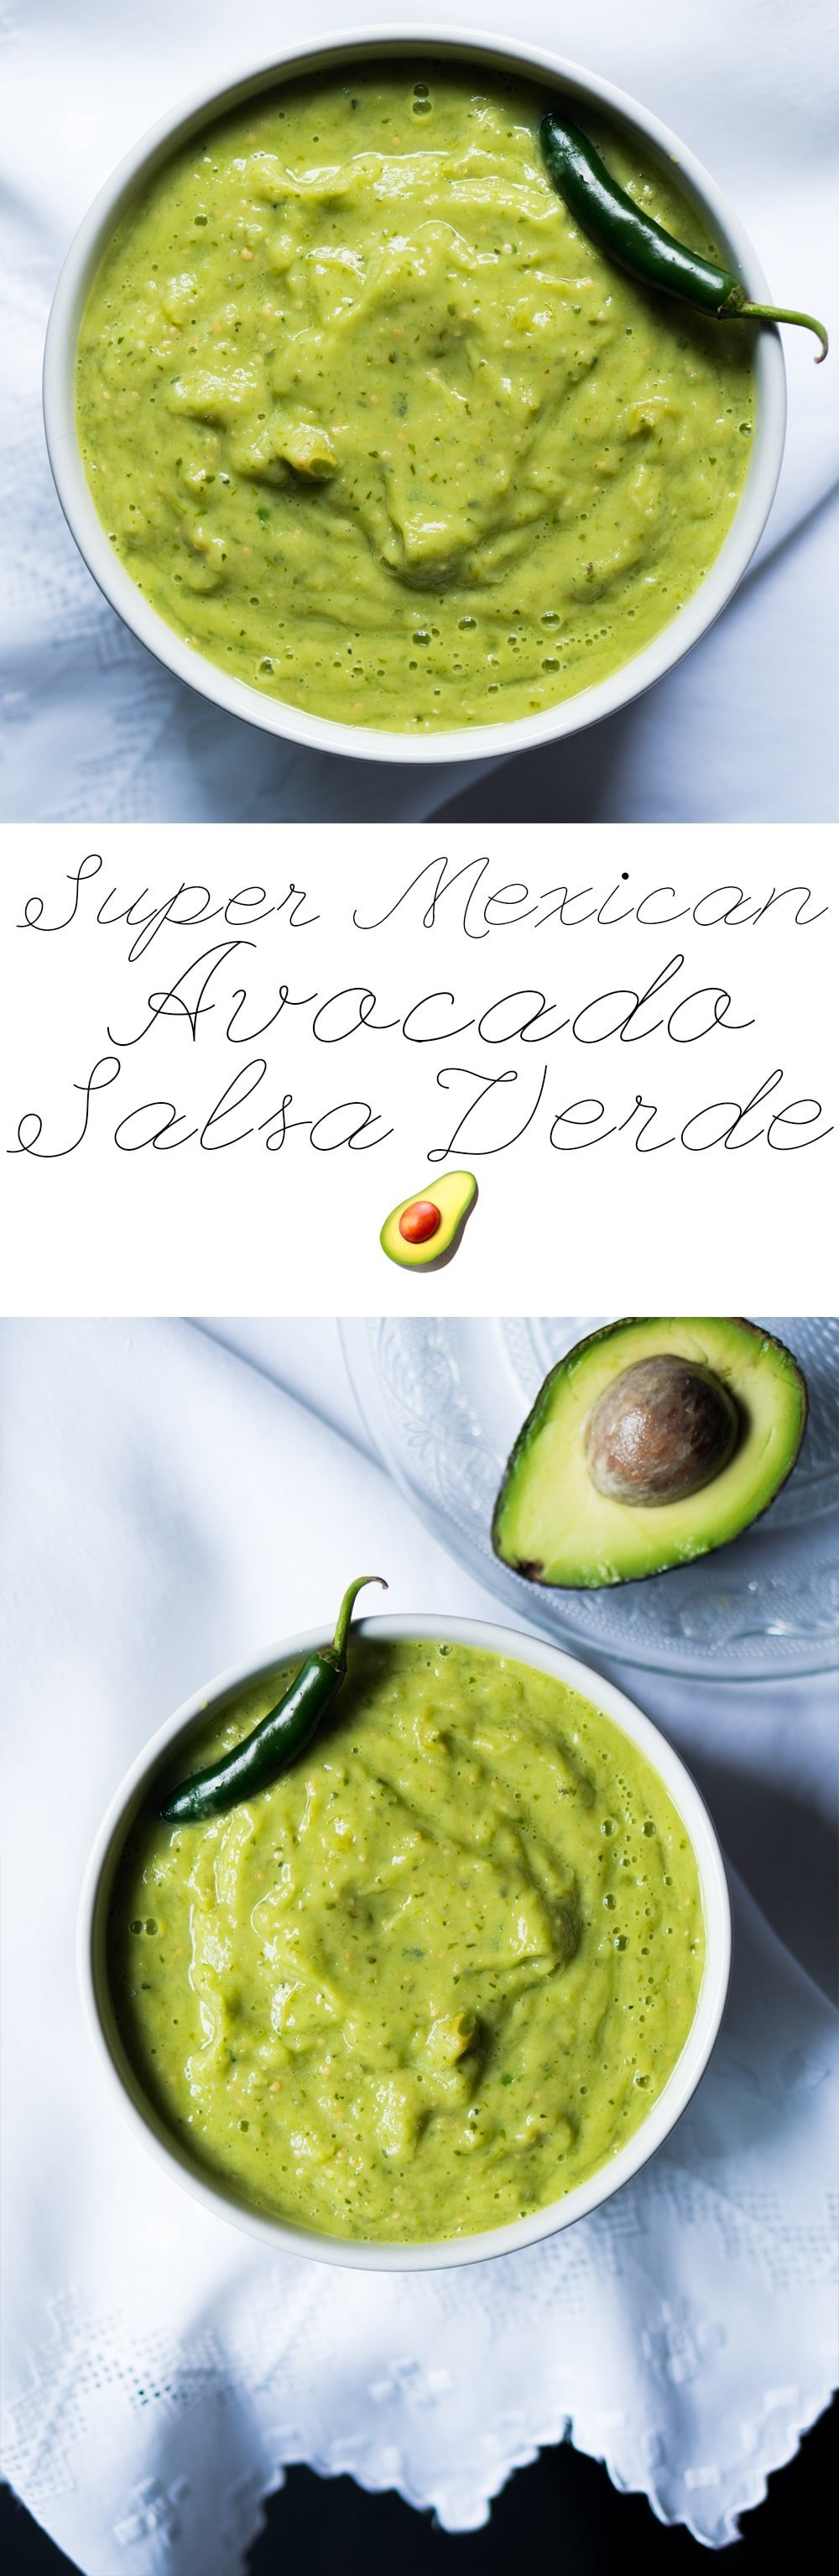 Suuuper Mexican Avocado Salsa Verde ? Gluten Free, Keto & Vegan